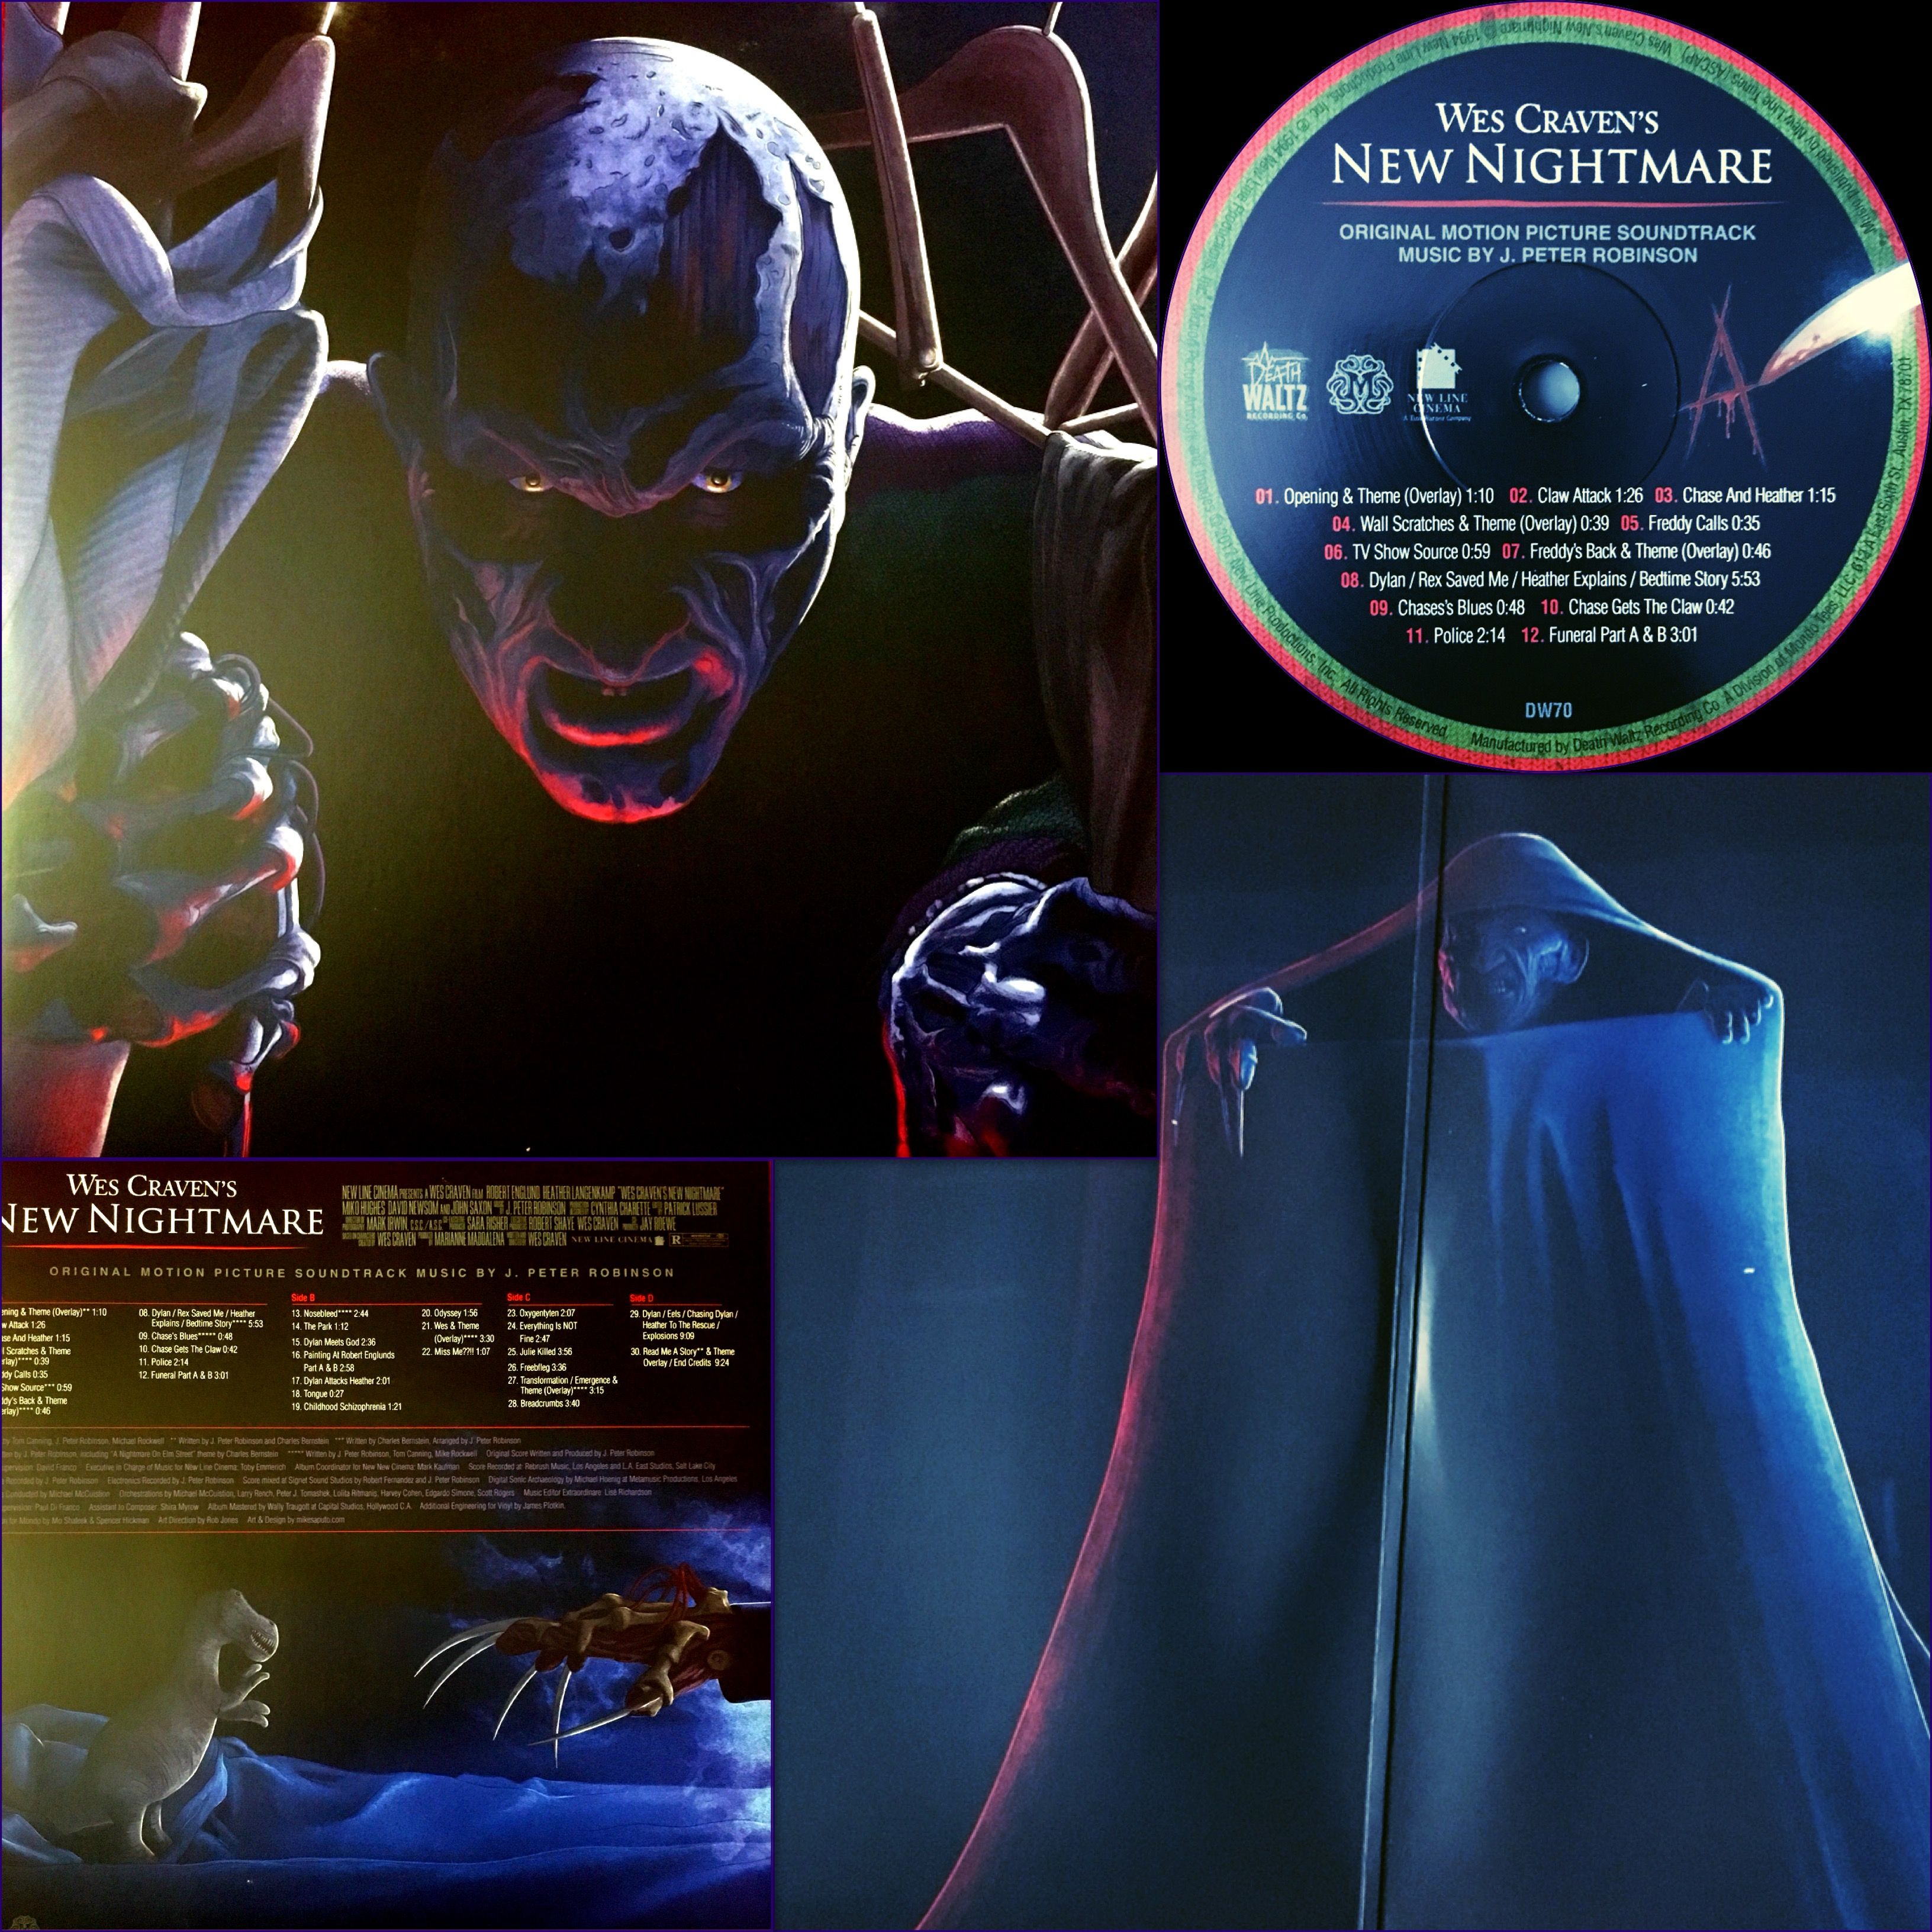 Nightmare On Elm Street New Nightmare Vinyl Box Of Souls Deathwaltz Records And Mondo Tees New Nightmare Nightmare On Elm Street Mondo Tees